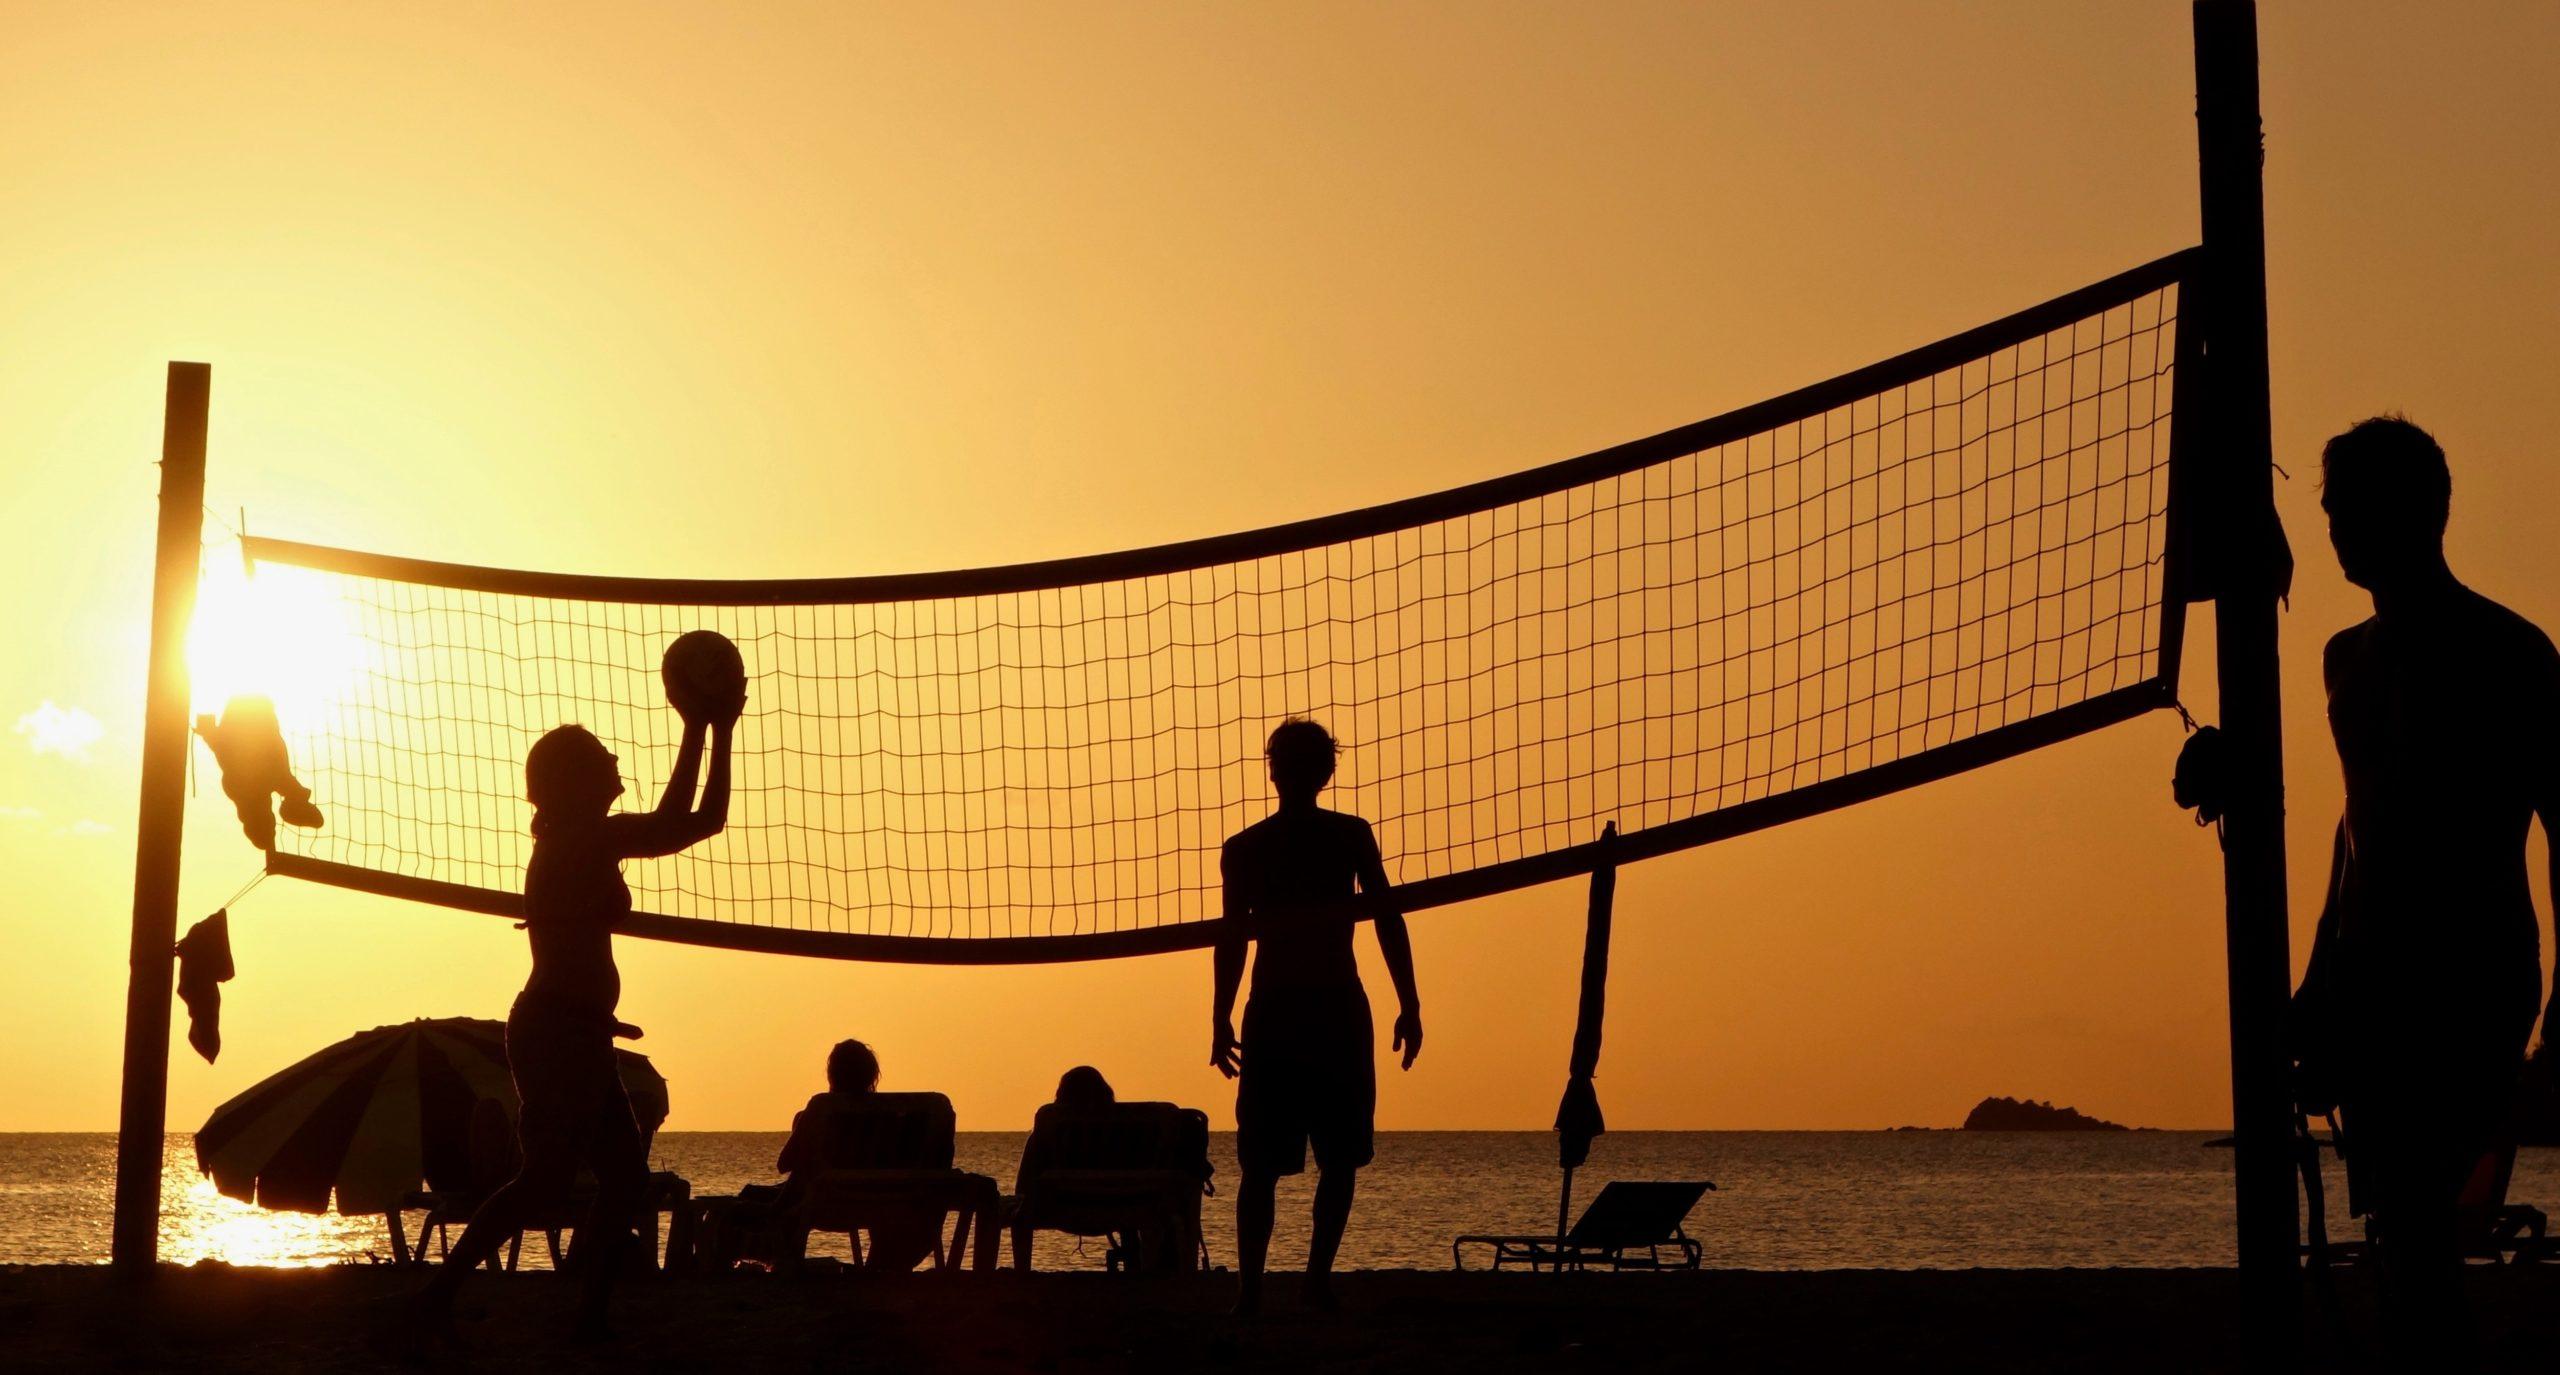 Best Beach Games for a Perfect Weekend Getaway